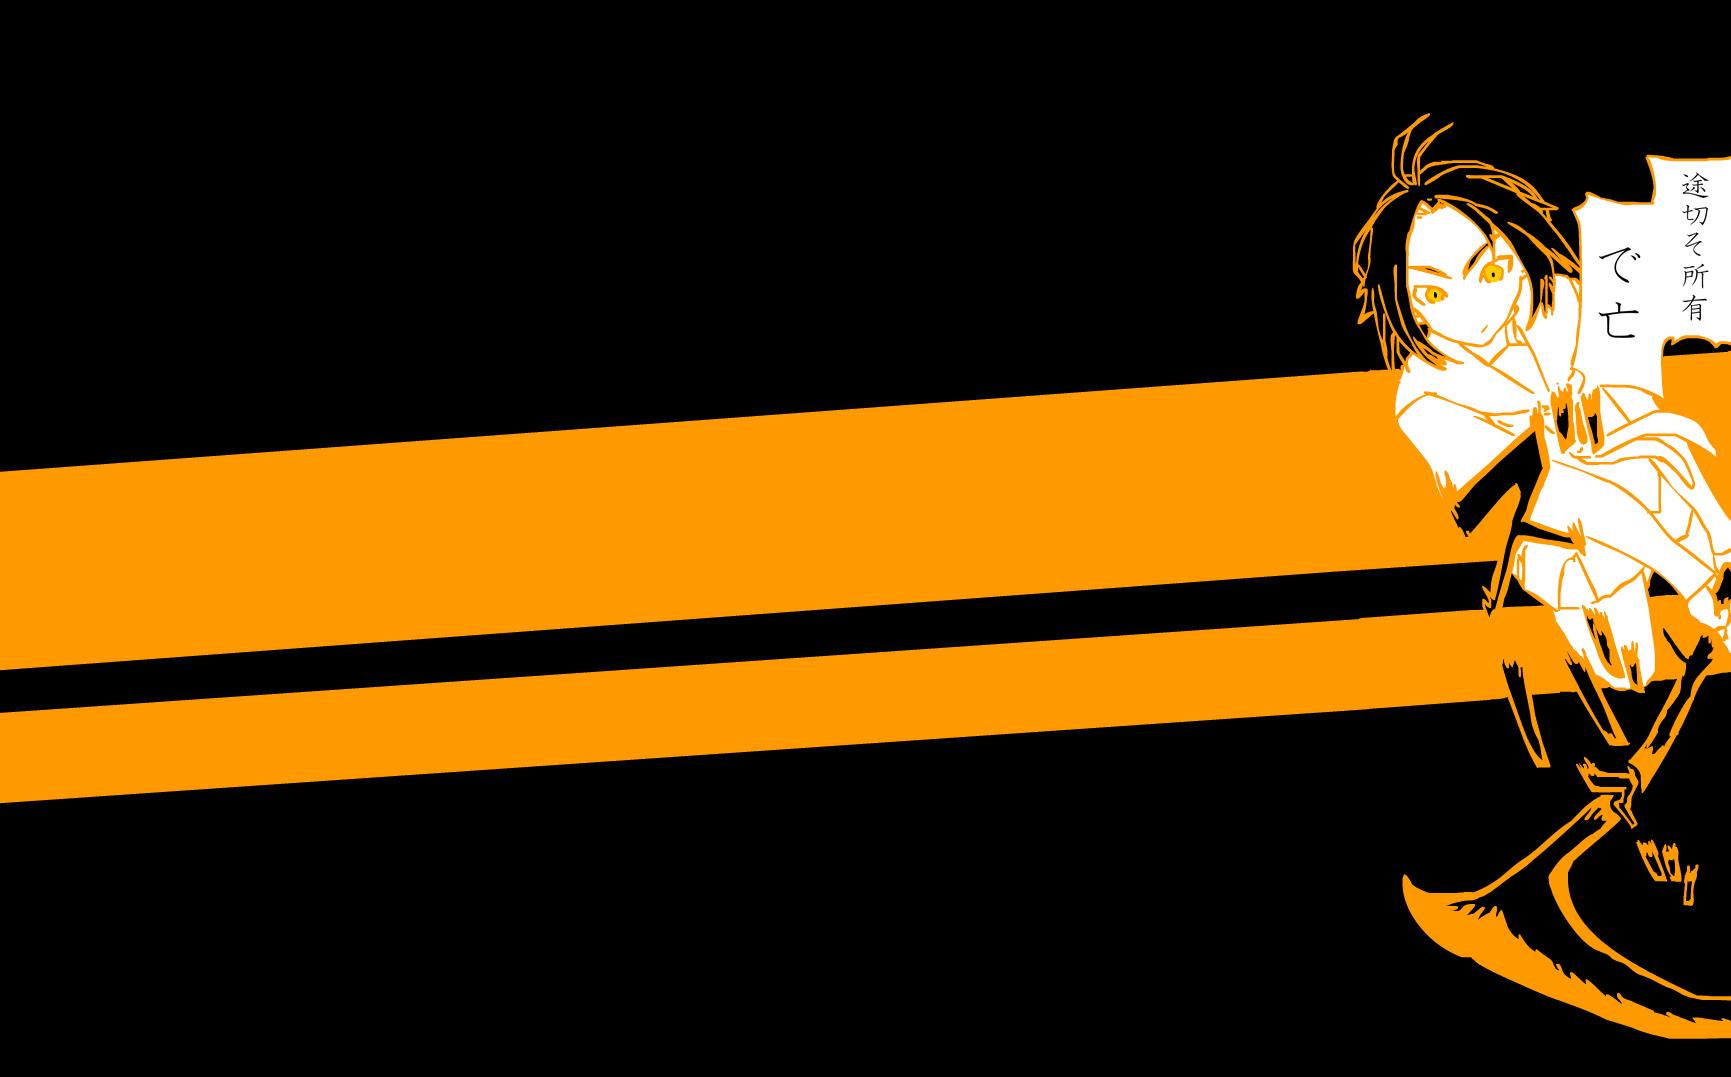 Mikanu Background